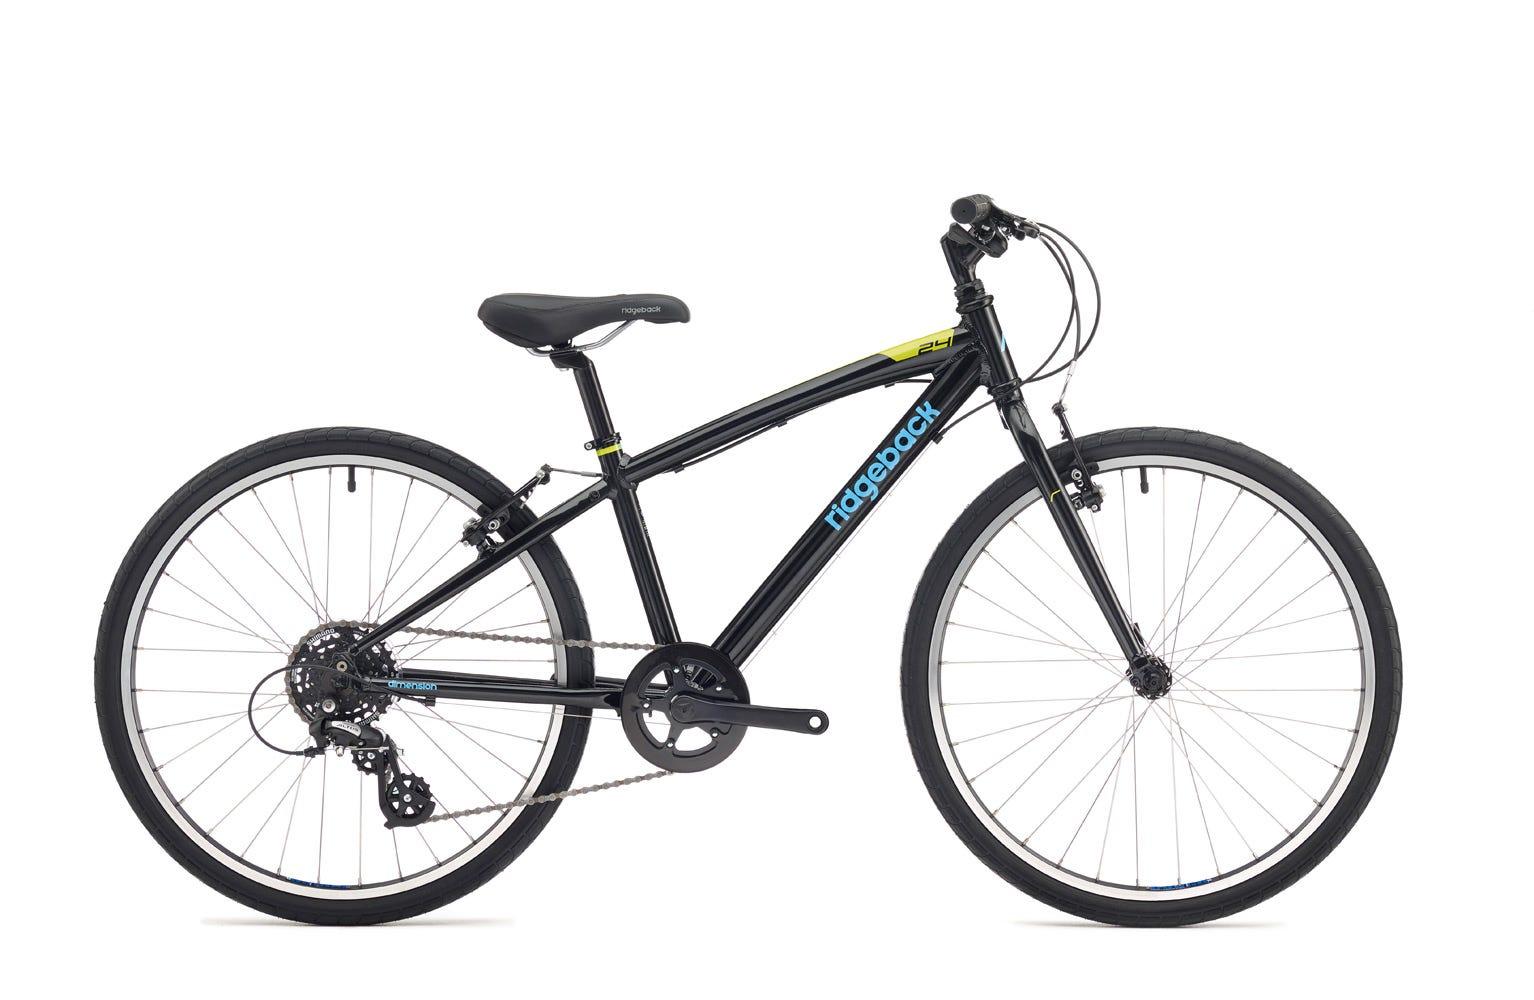 Ridgeback Dimension 24 inch bike black Ex Display